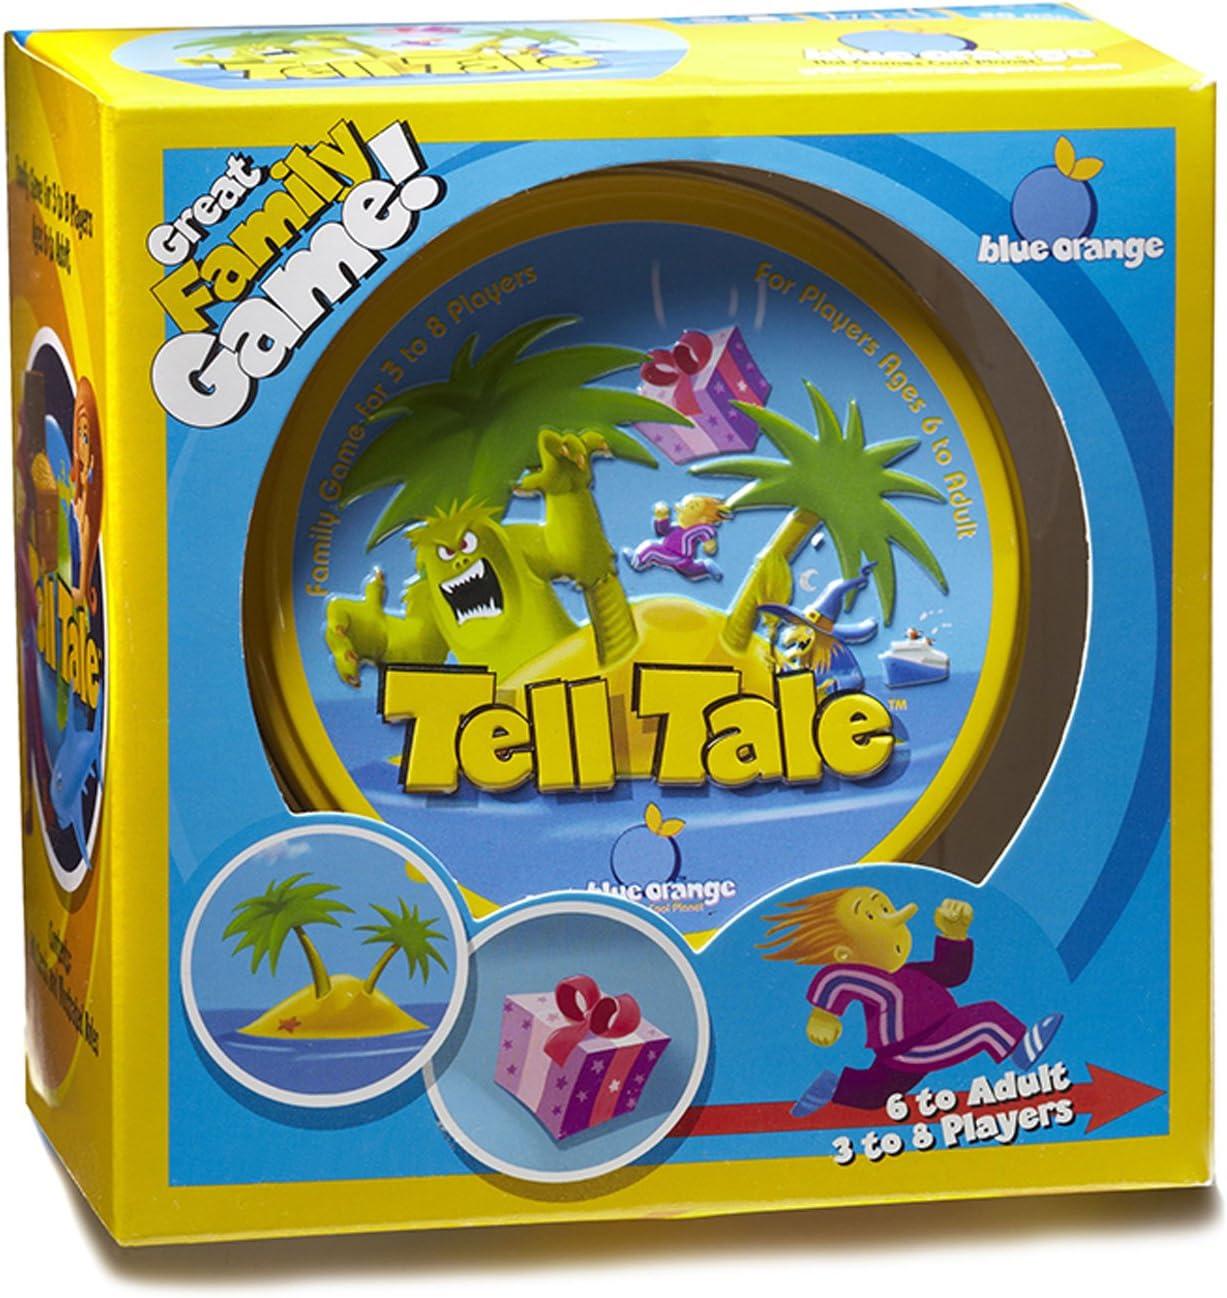 Fairytale Edition Tell-A-Tale Game